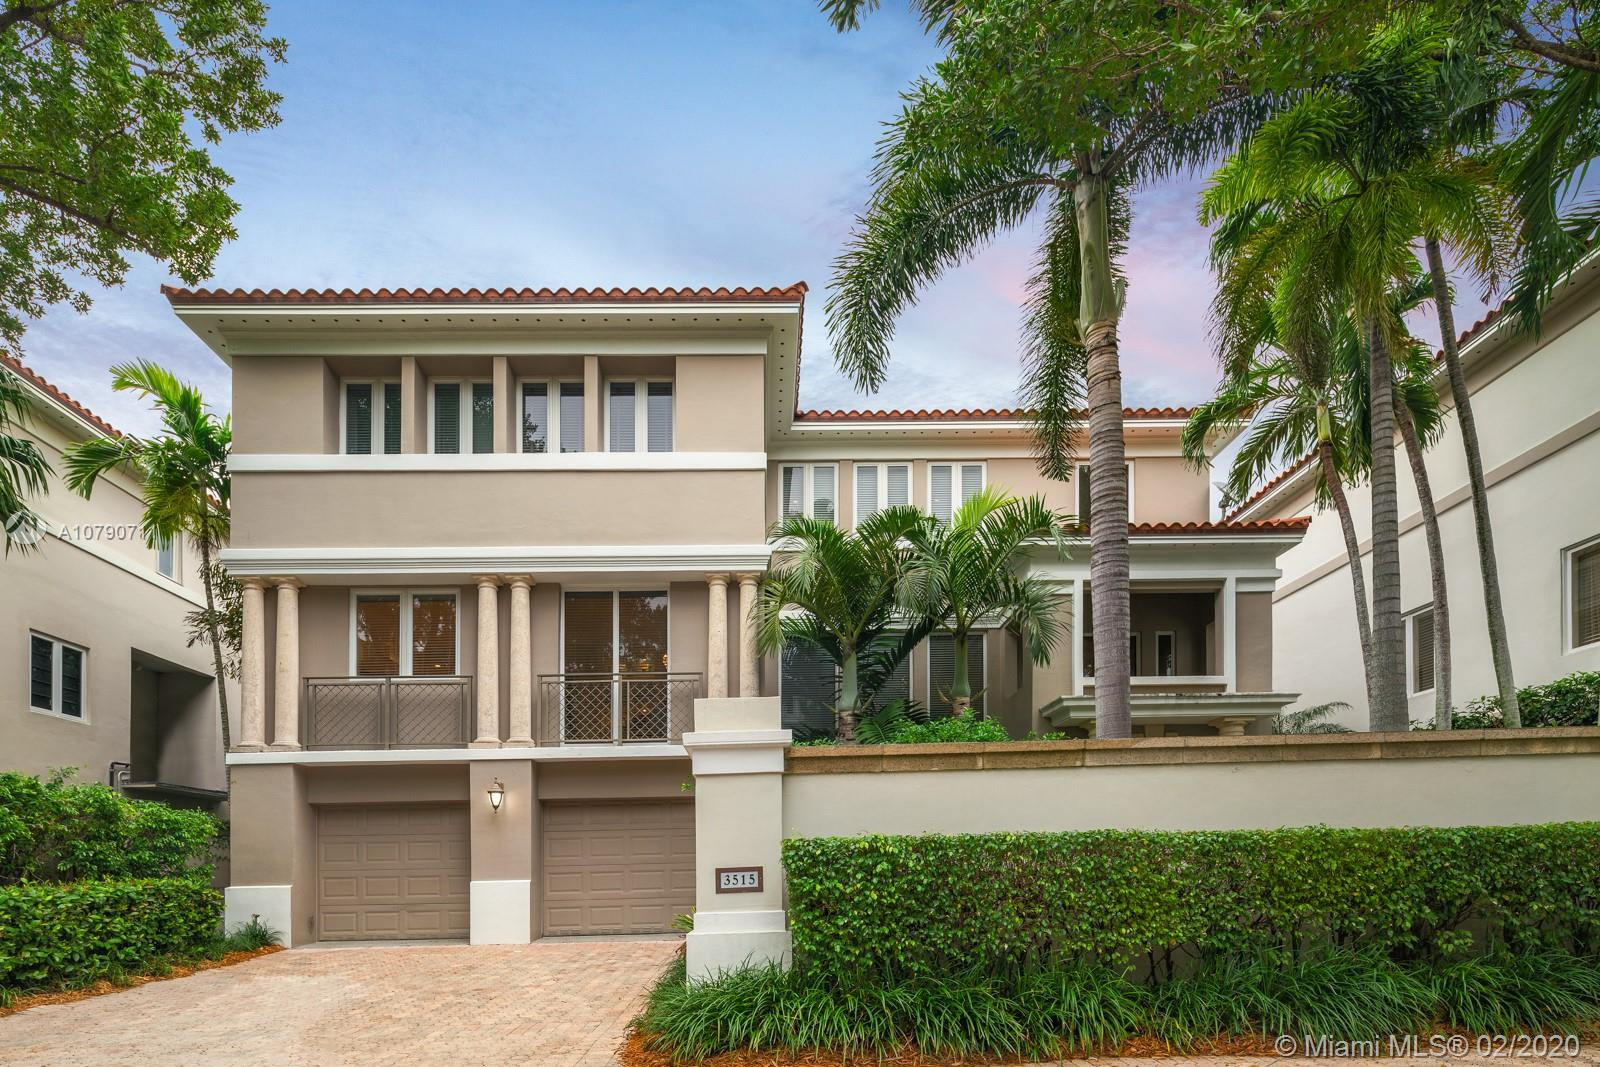 3515 Bayshore Villas Dr, Miami, FL 33133